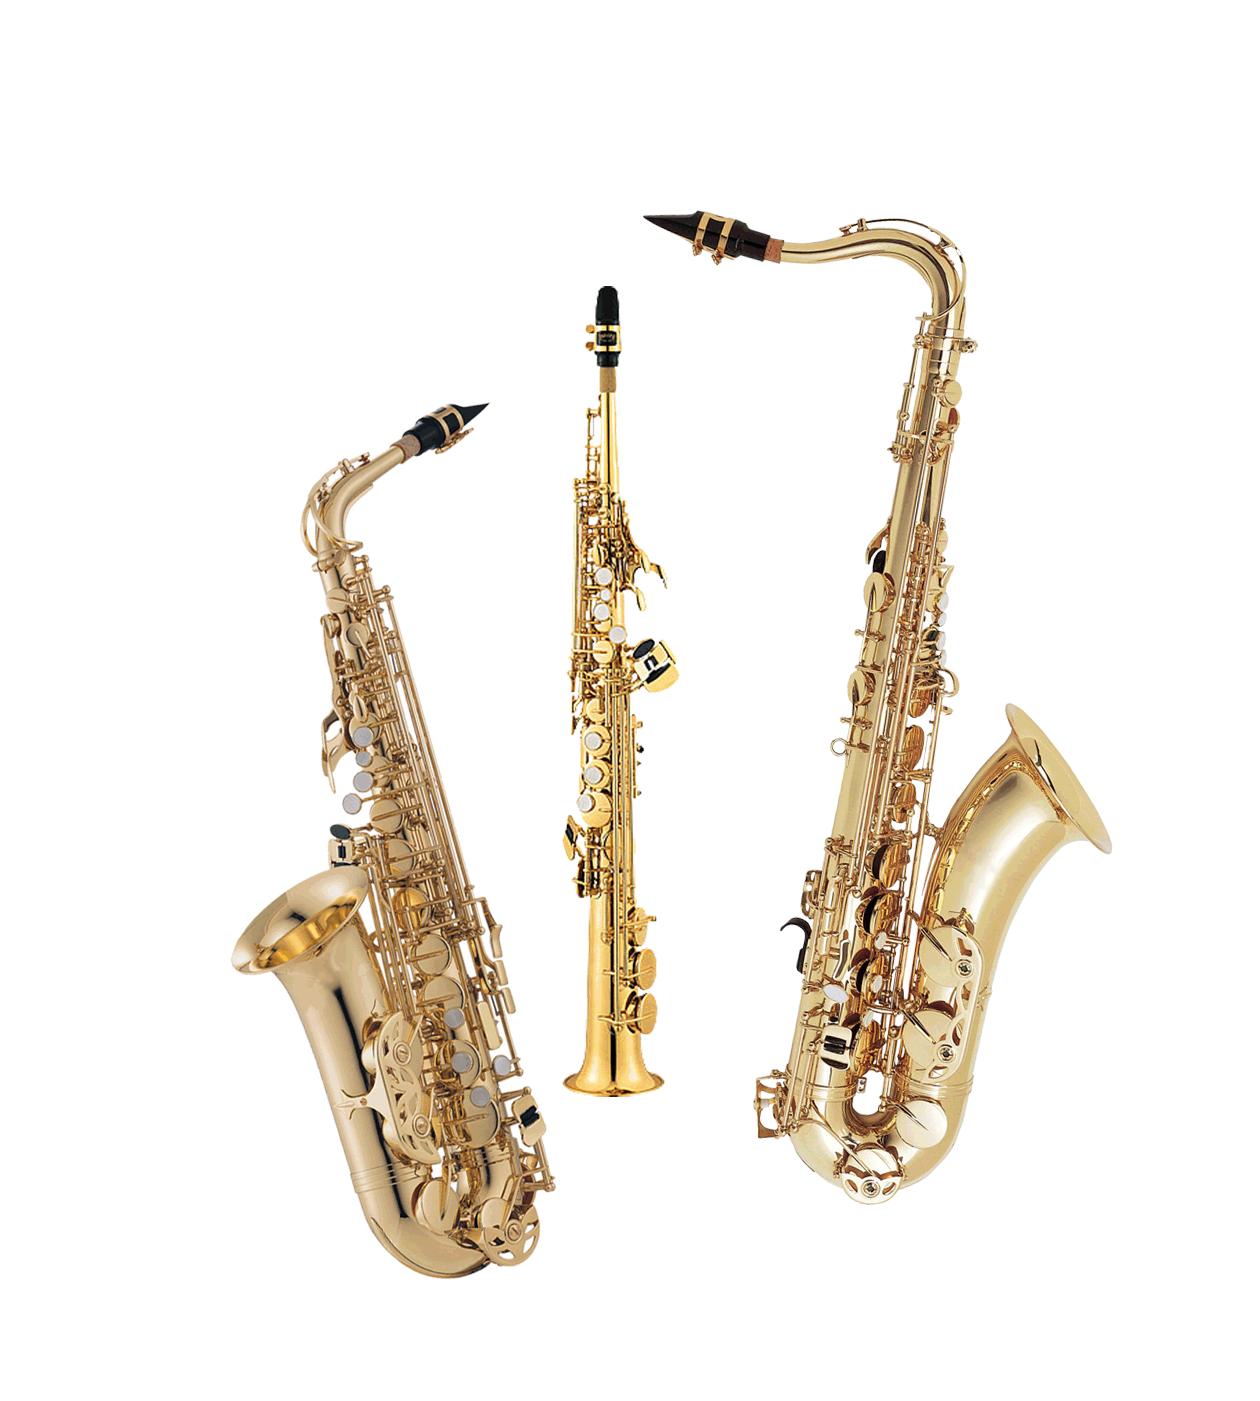 Sax Trio Sheet Music - Classical Saxophone trio arrangements